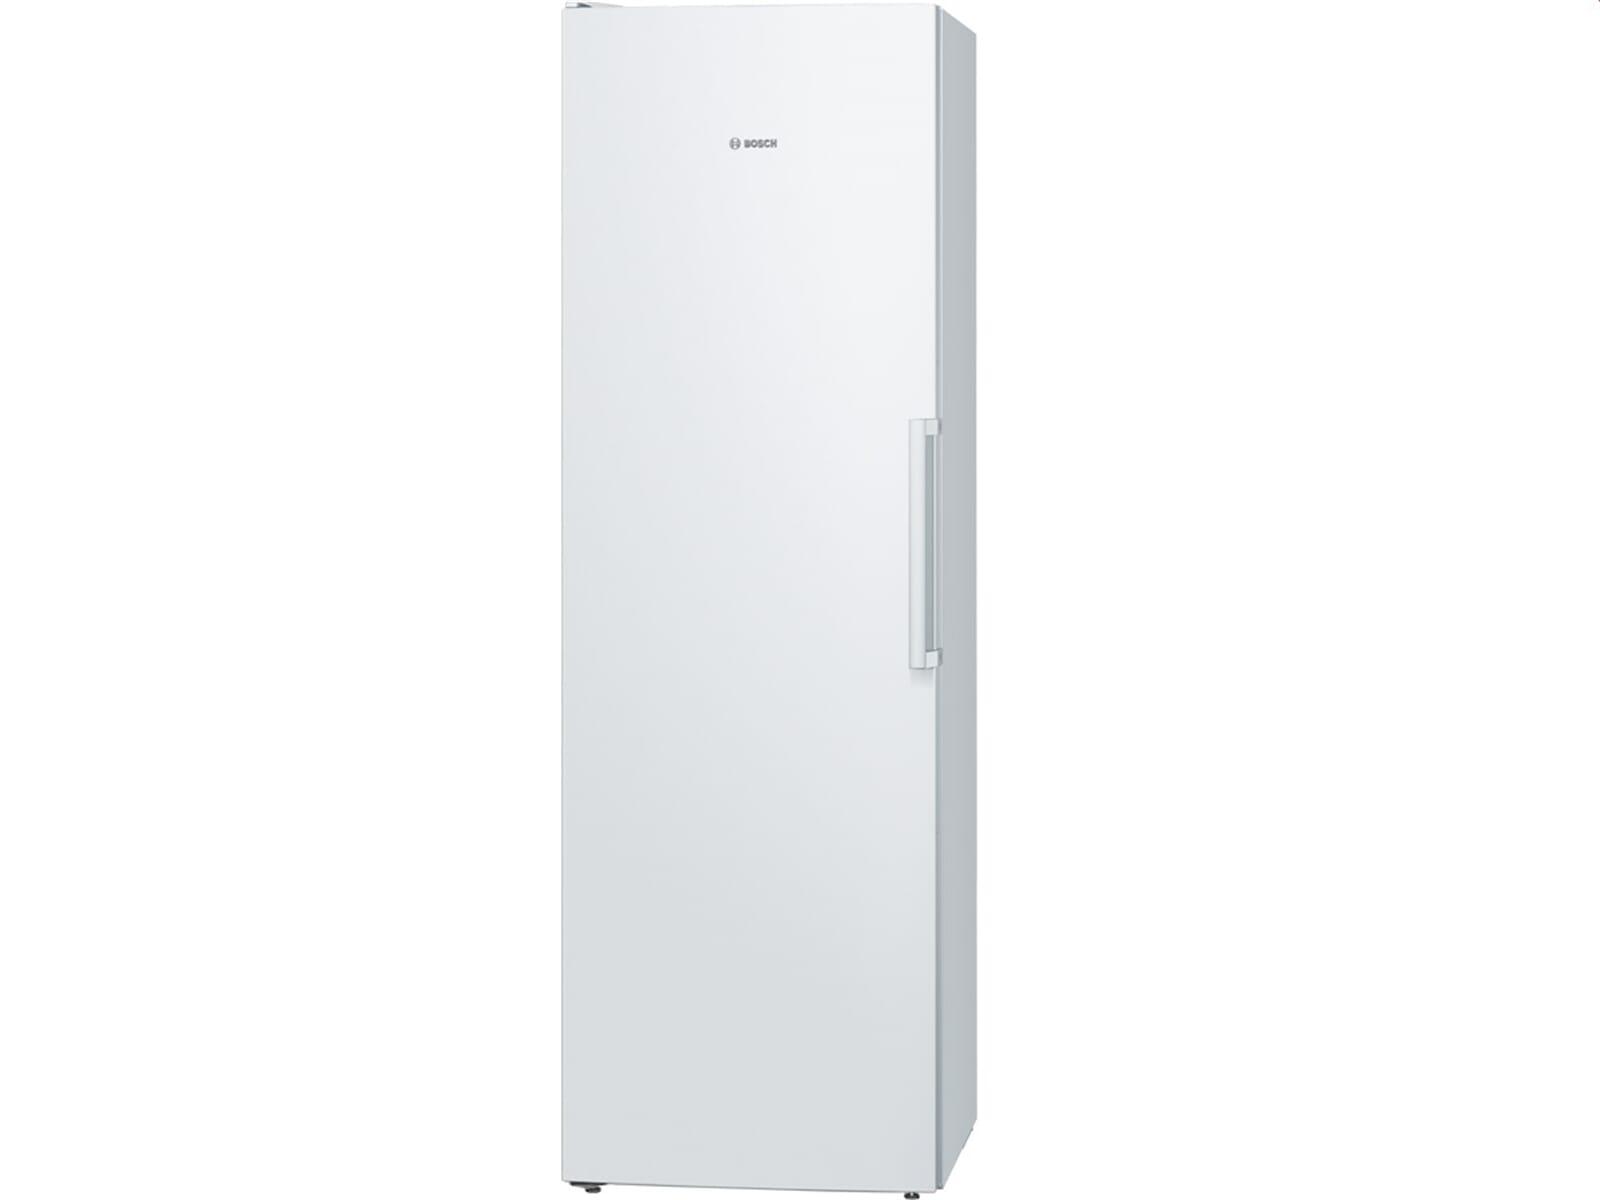 Bosch ksv36vw40 standkuhlschrank weiss for Bosch standkühlschrank